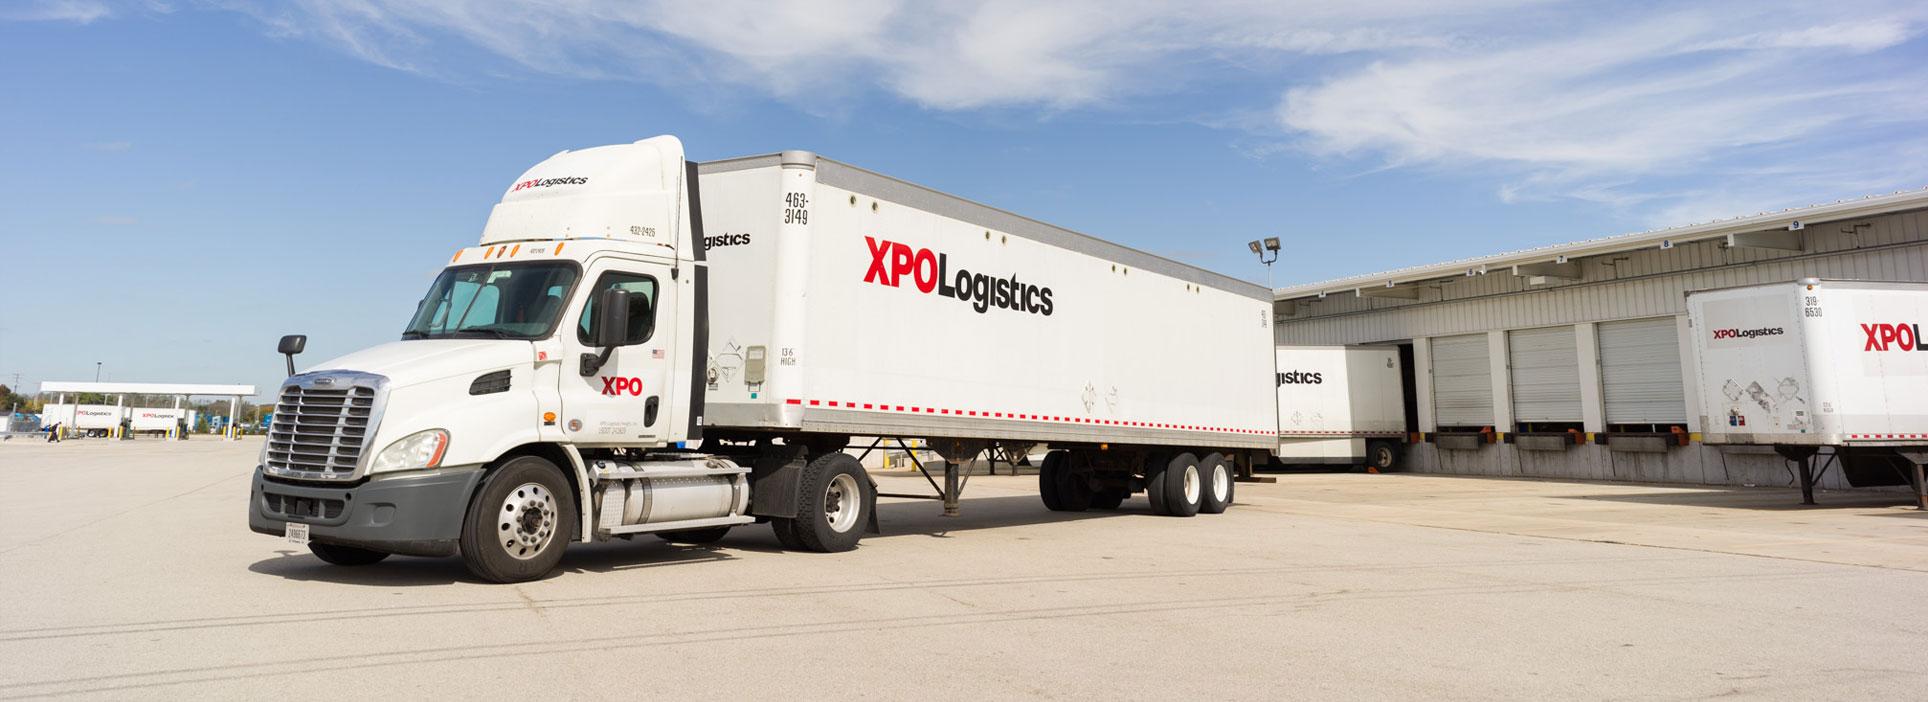 Track a Shipment - Track a Shipment - XPO Logistics